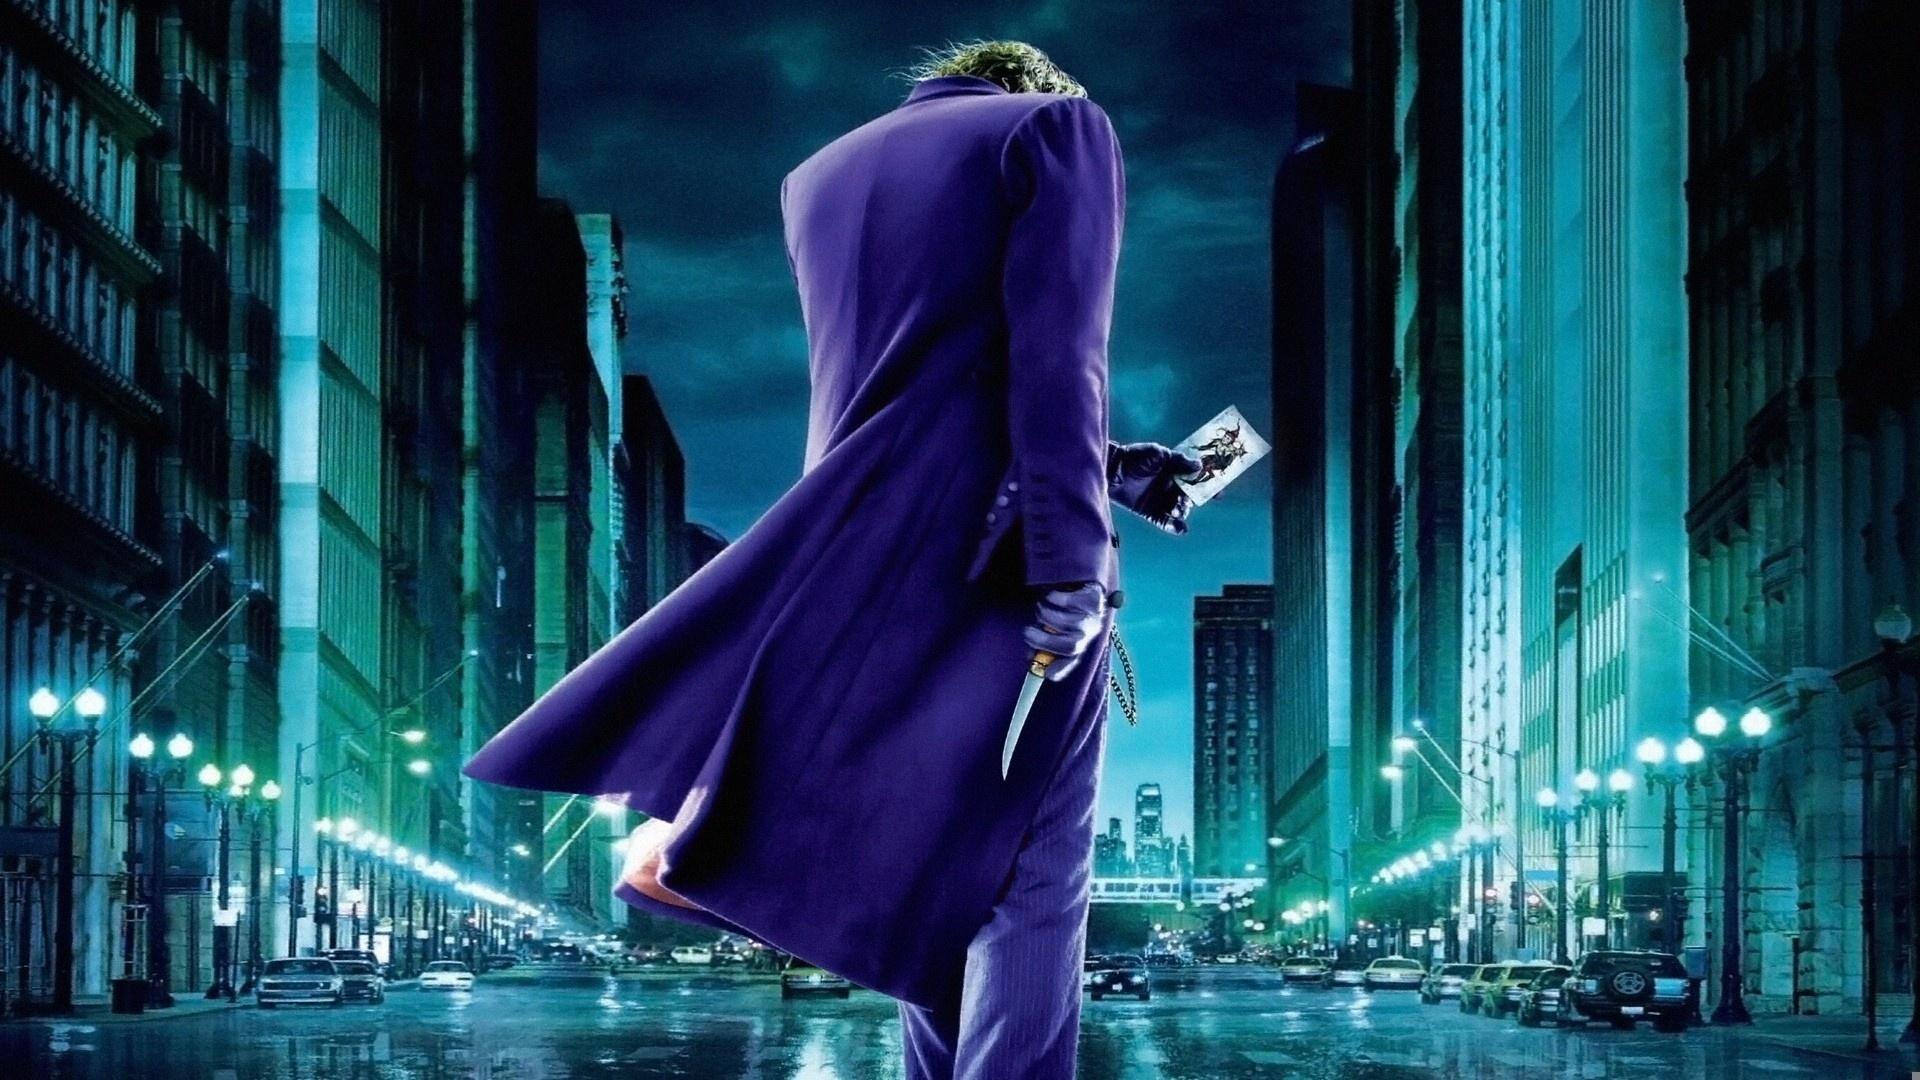 Joker in The Dark Knight Wallpapers HD Wallpapers 1920x1080